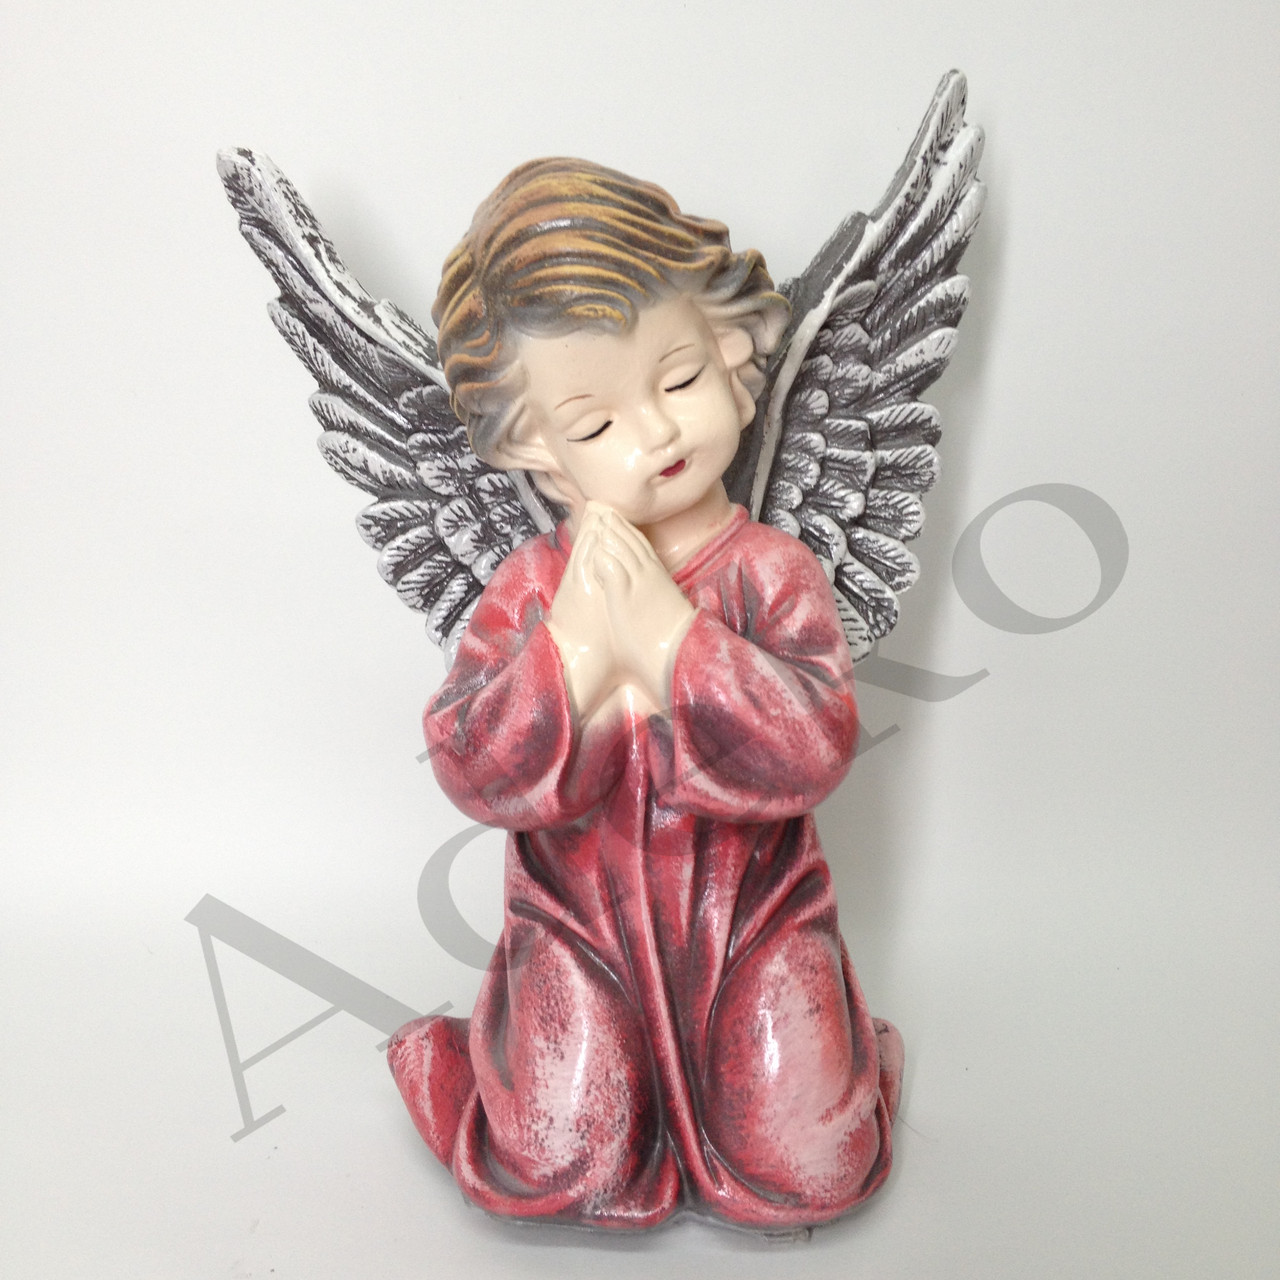 Статуетка із гіпсу Янголятко з крилами 28 см